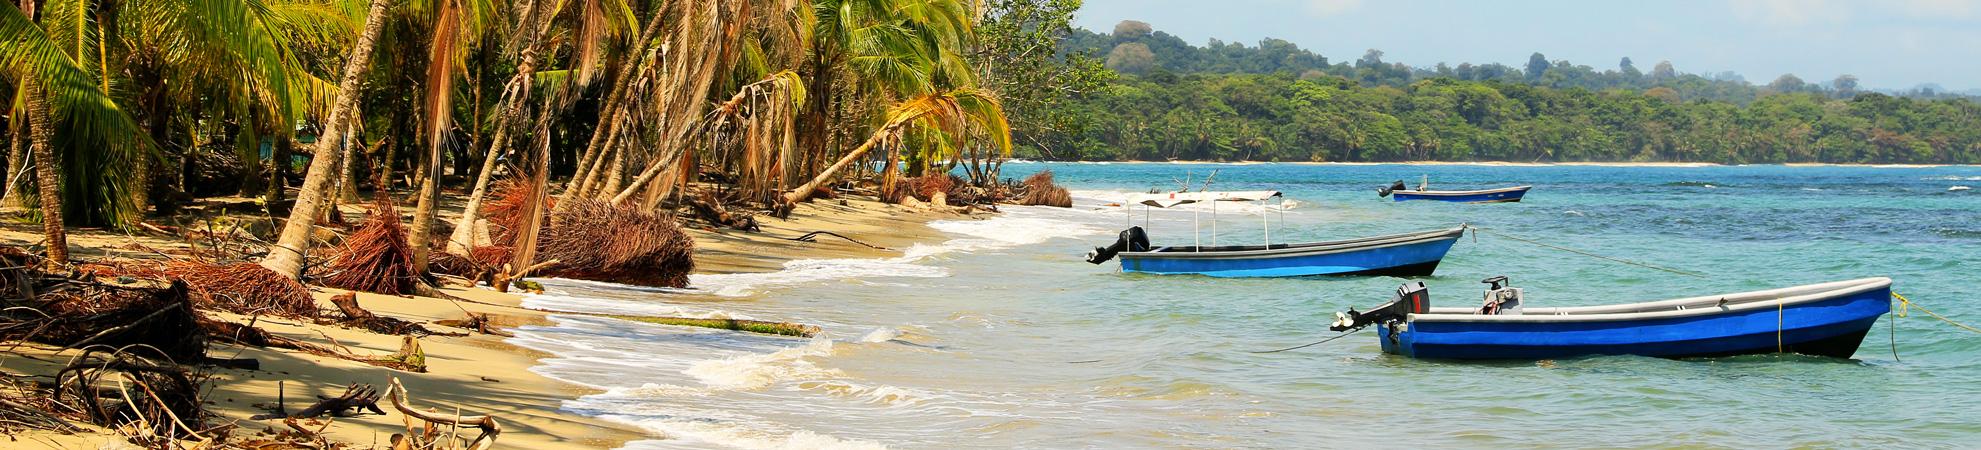 Se rendre au Costa Rica par bateau